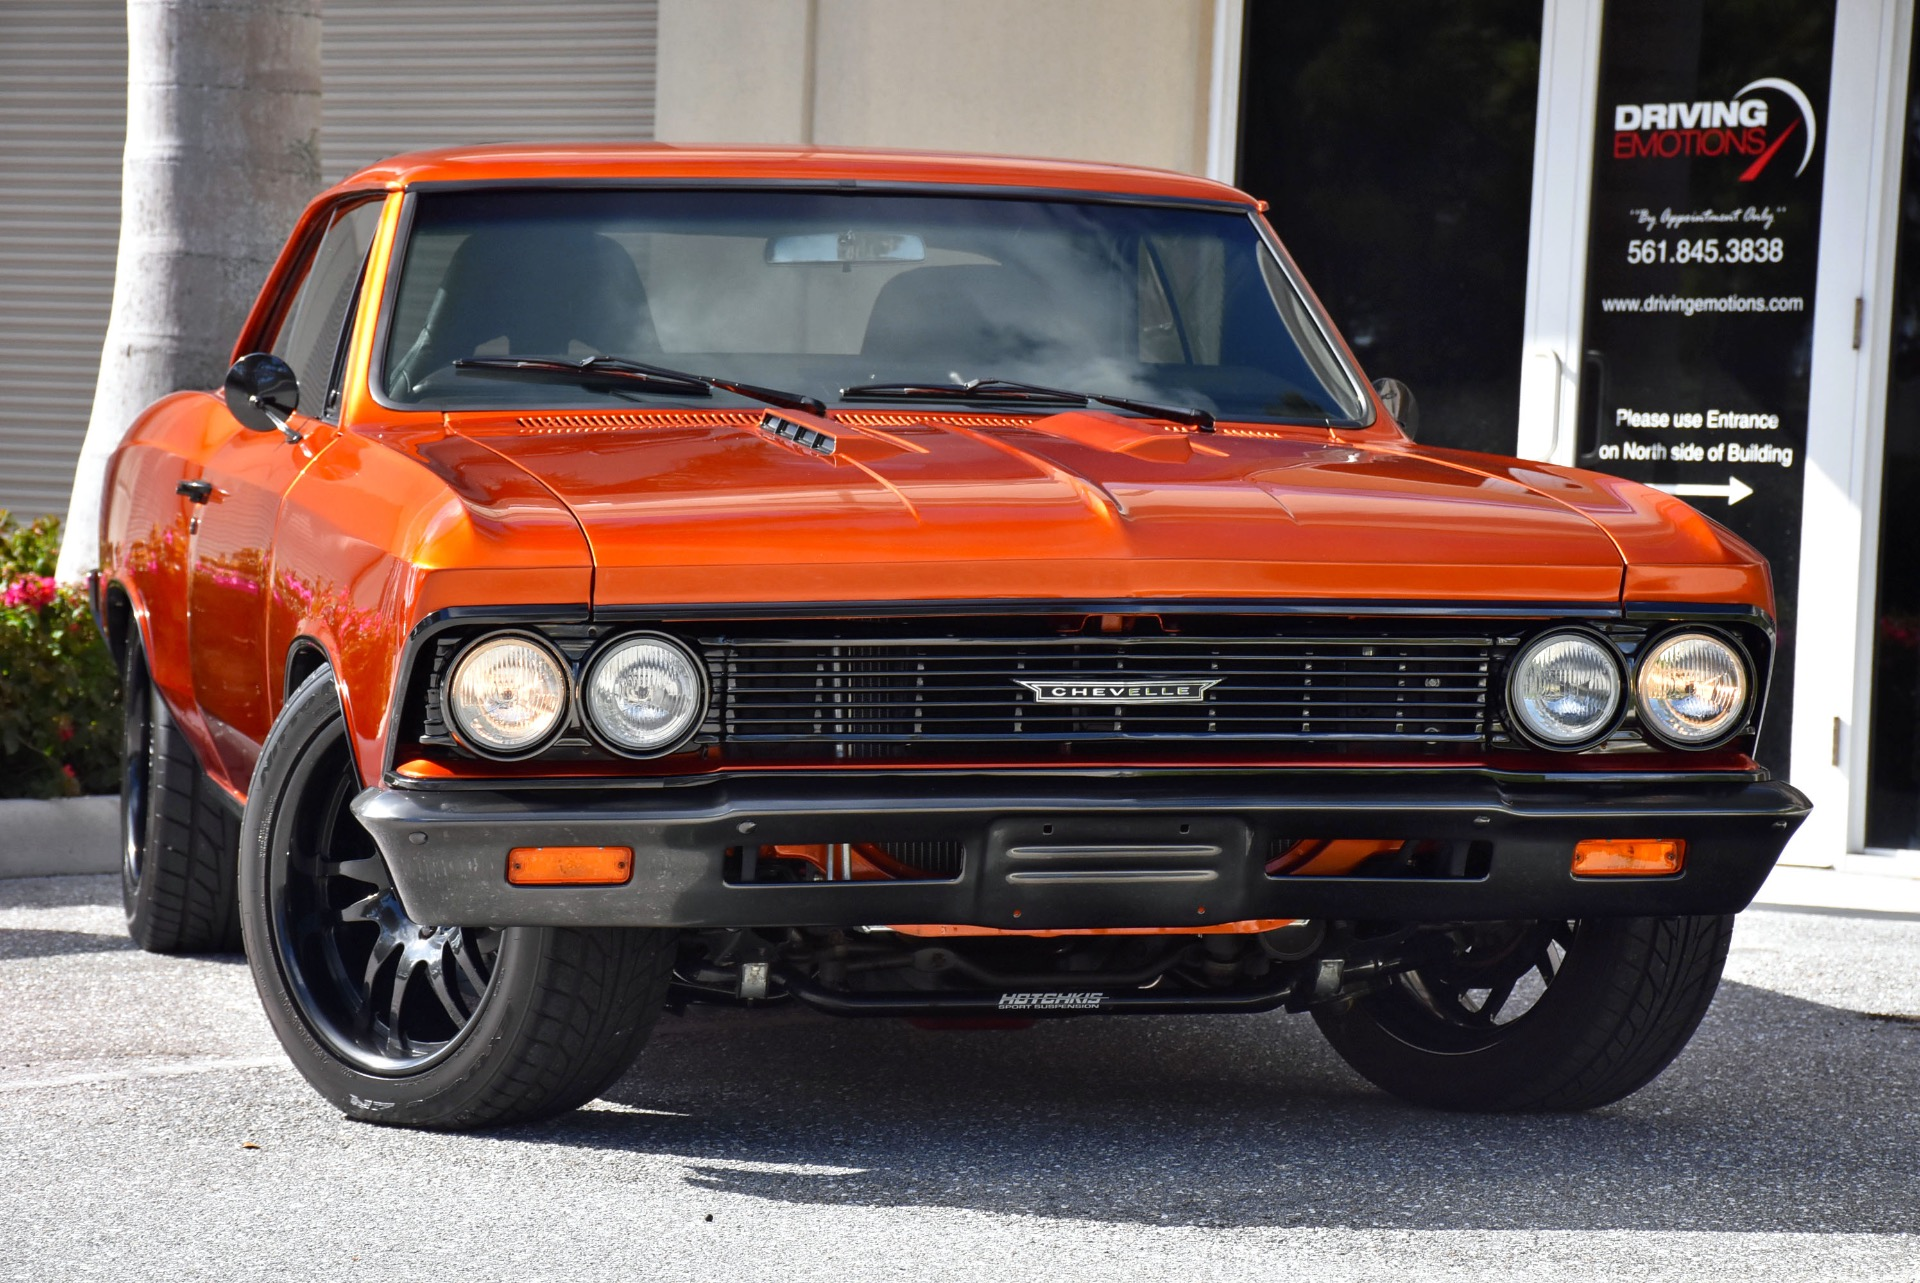 1966 Chevrolet Chevelle Resto Mod Stock # 5918 visit www